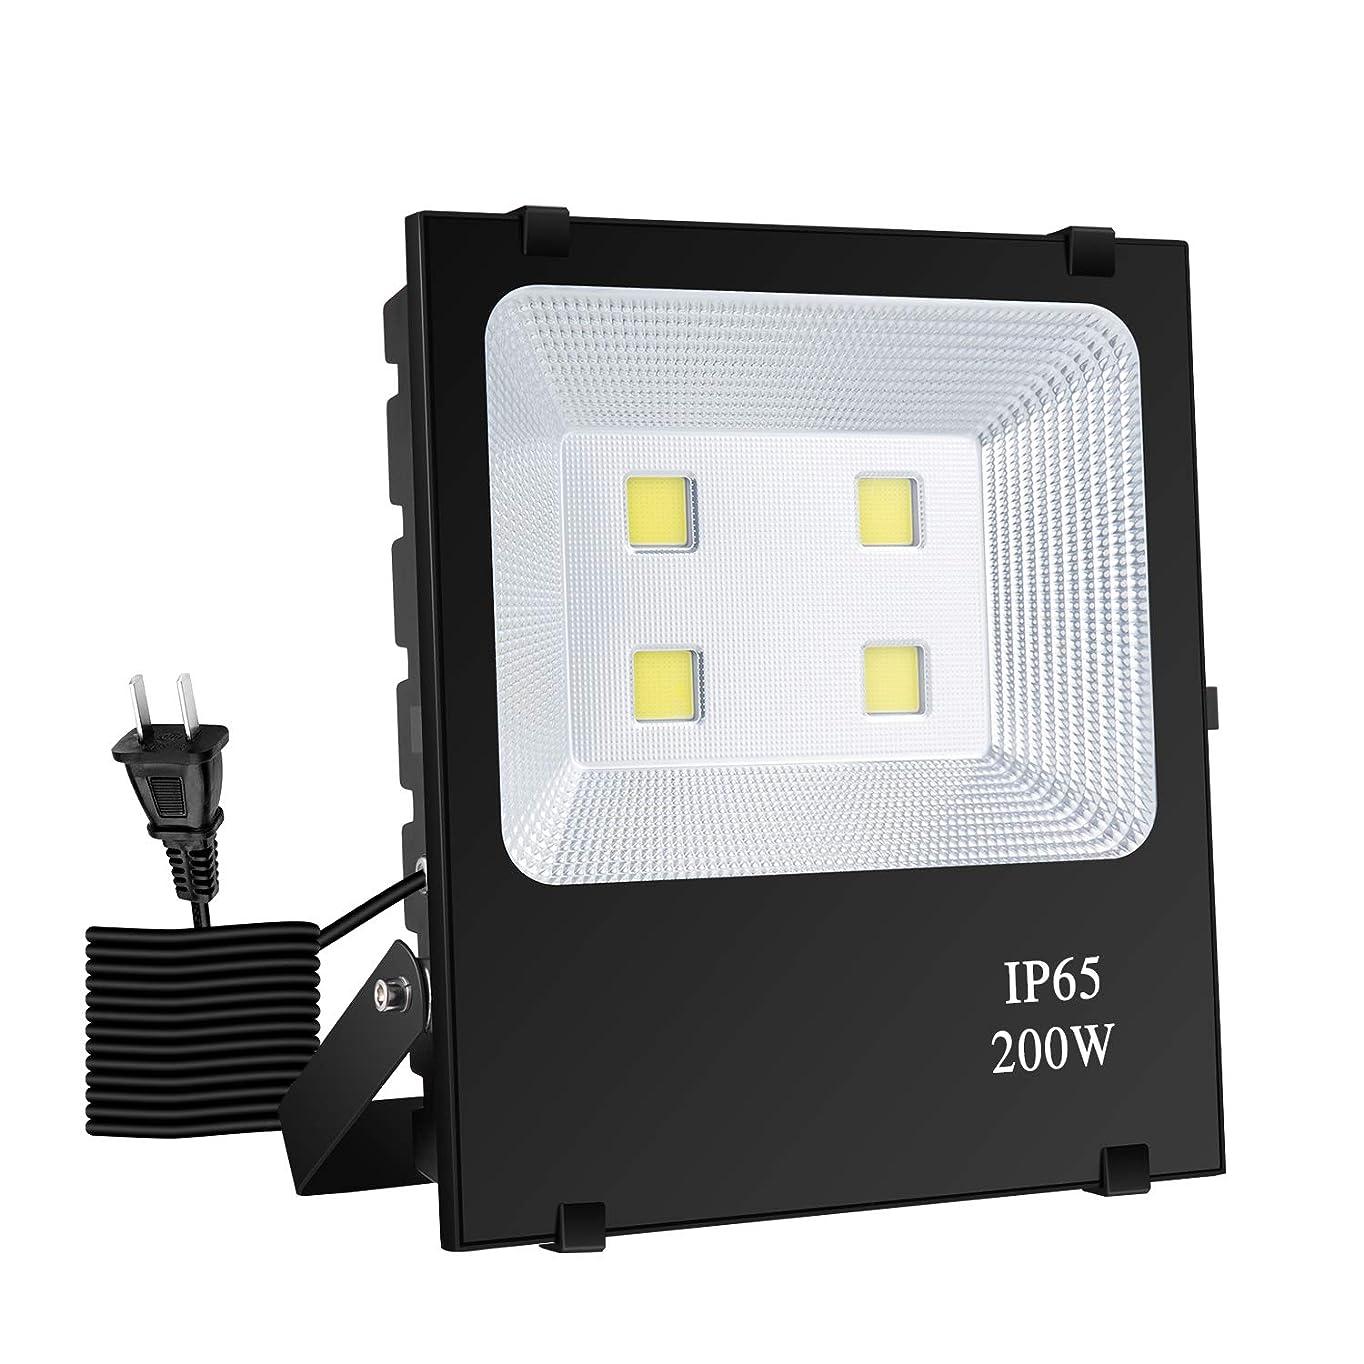 MORSEN LED投光器 200W フラッドライト昼光色 2800LM IP65防水 1.8コード付き プラグとスイッチ付き LEDライト 作業灯 屋外照明 看板灯 集魚灯 駐車場用